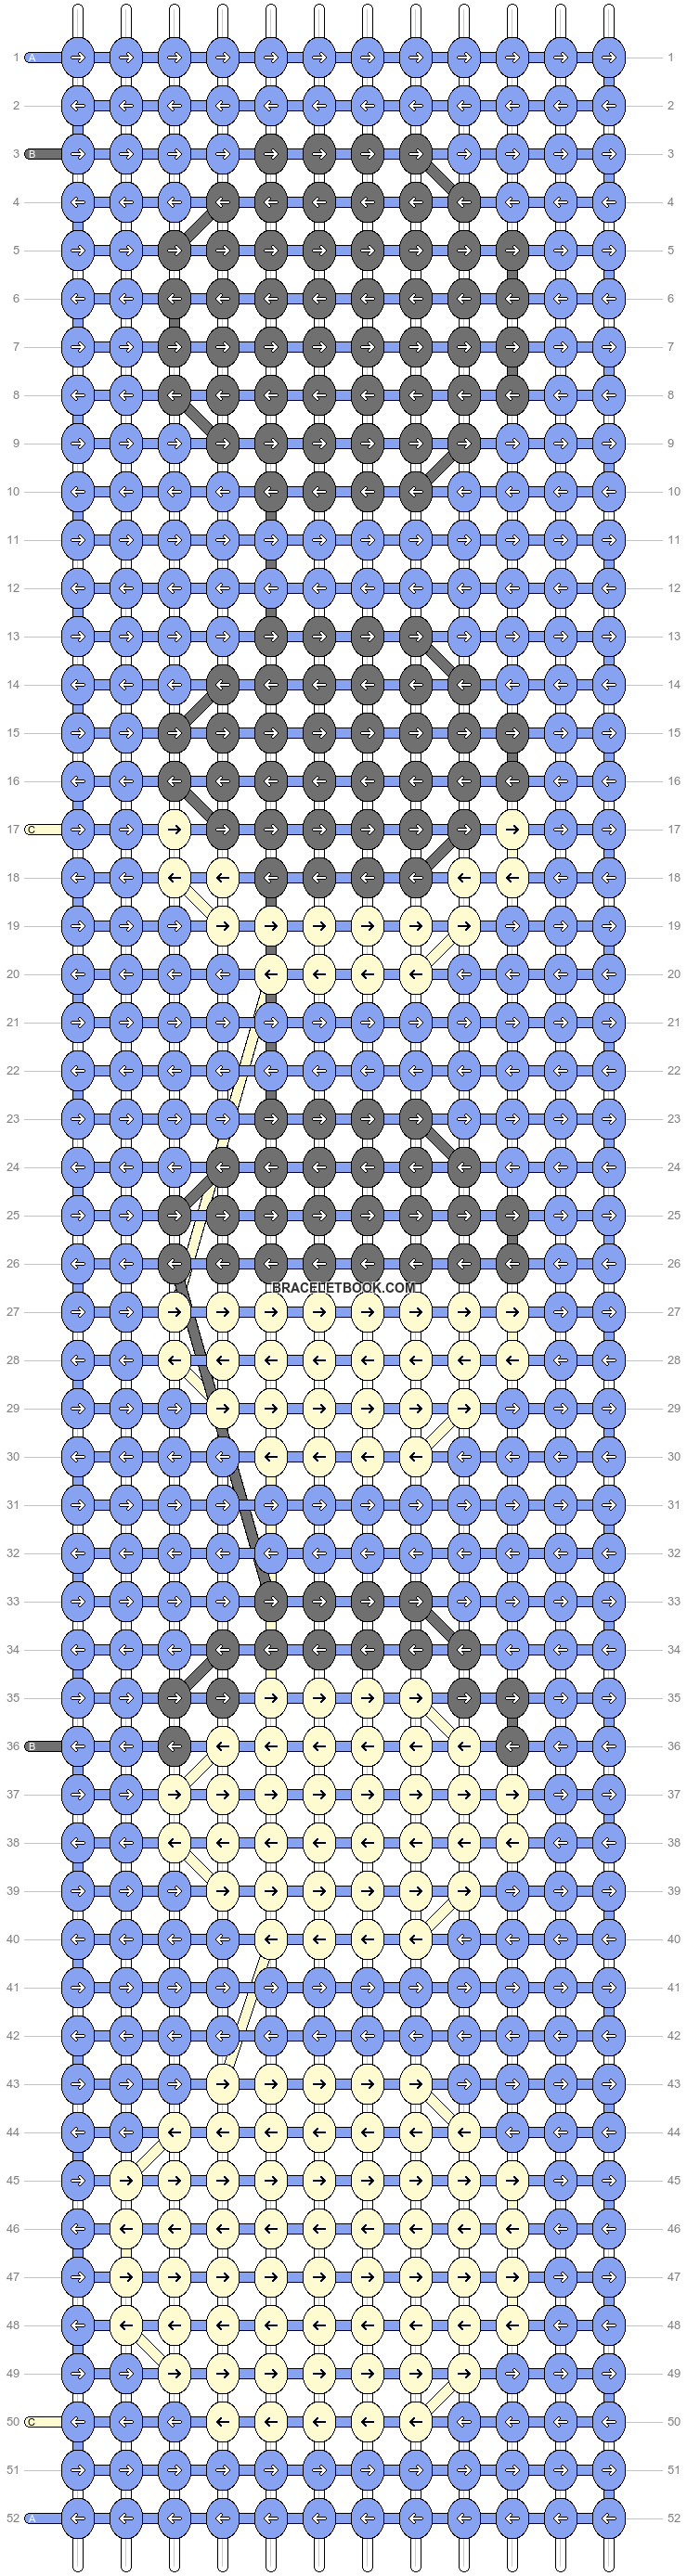 Alpha pattern #92541 pattern